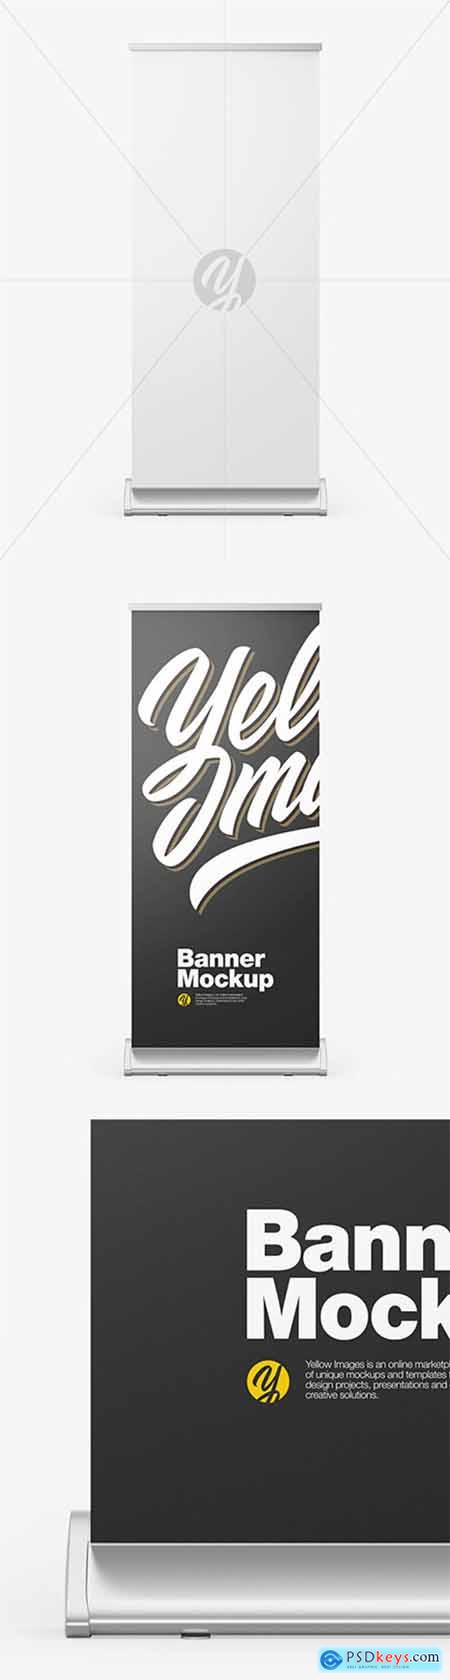 Metallic Roll-up Banner Mockup 79392